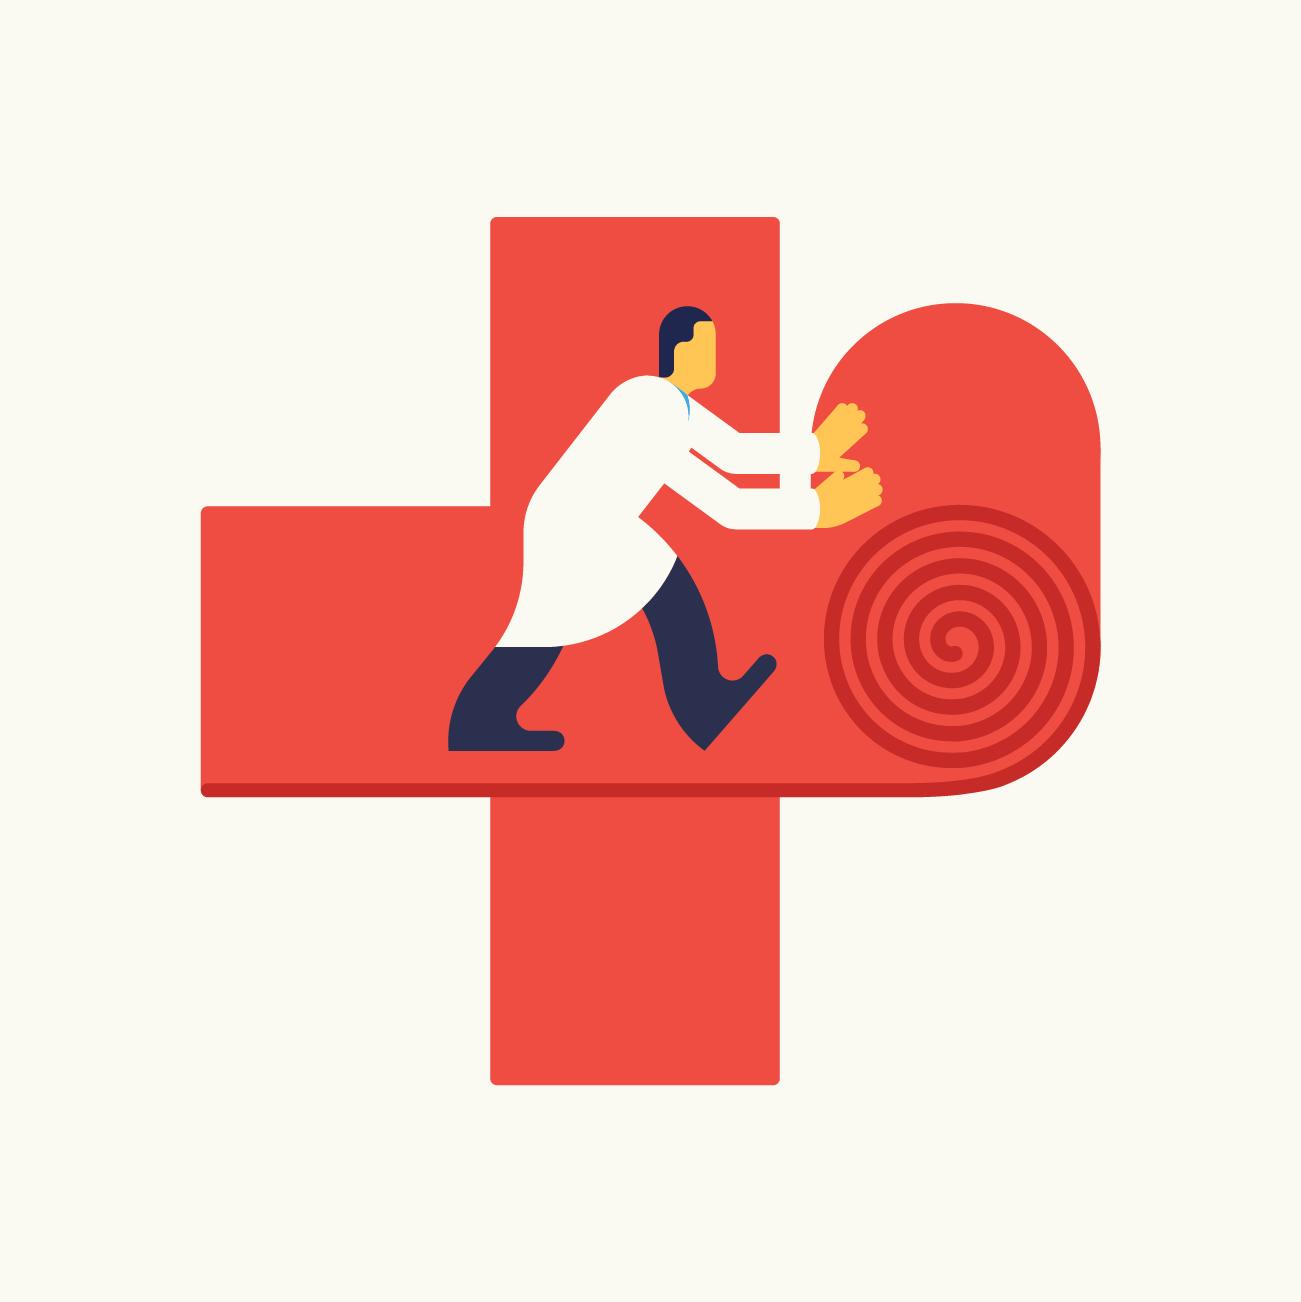 The path to health. Zifferdrei